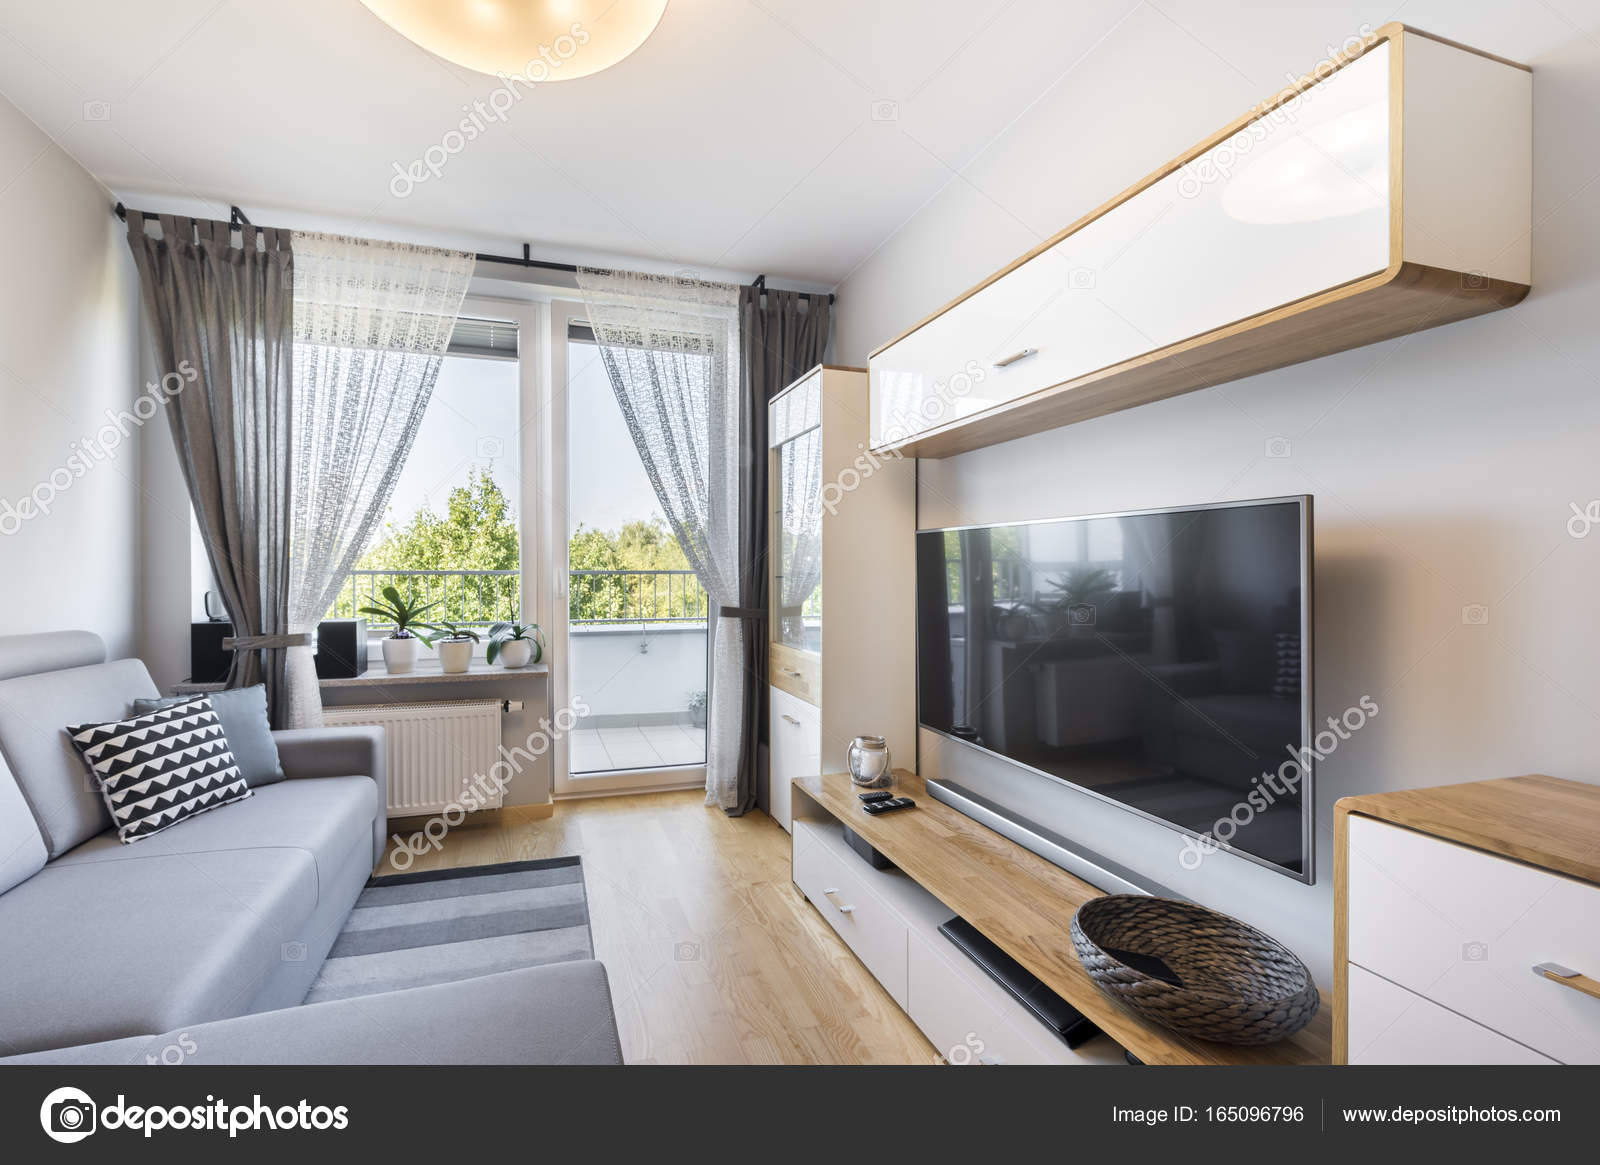 Woonkamer Klein Appartement : Woonkamer in klein appartement u stockfoto jacek kadaj